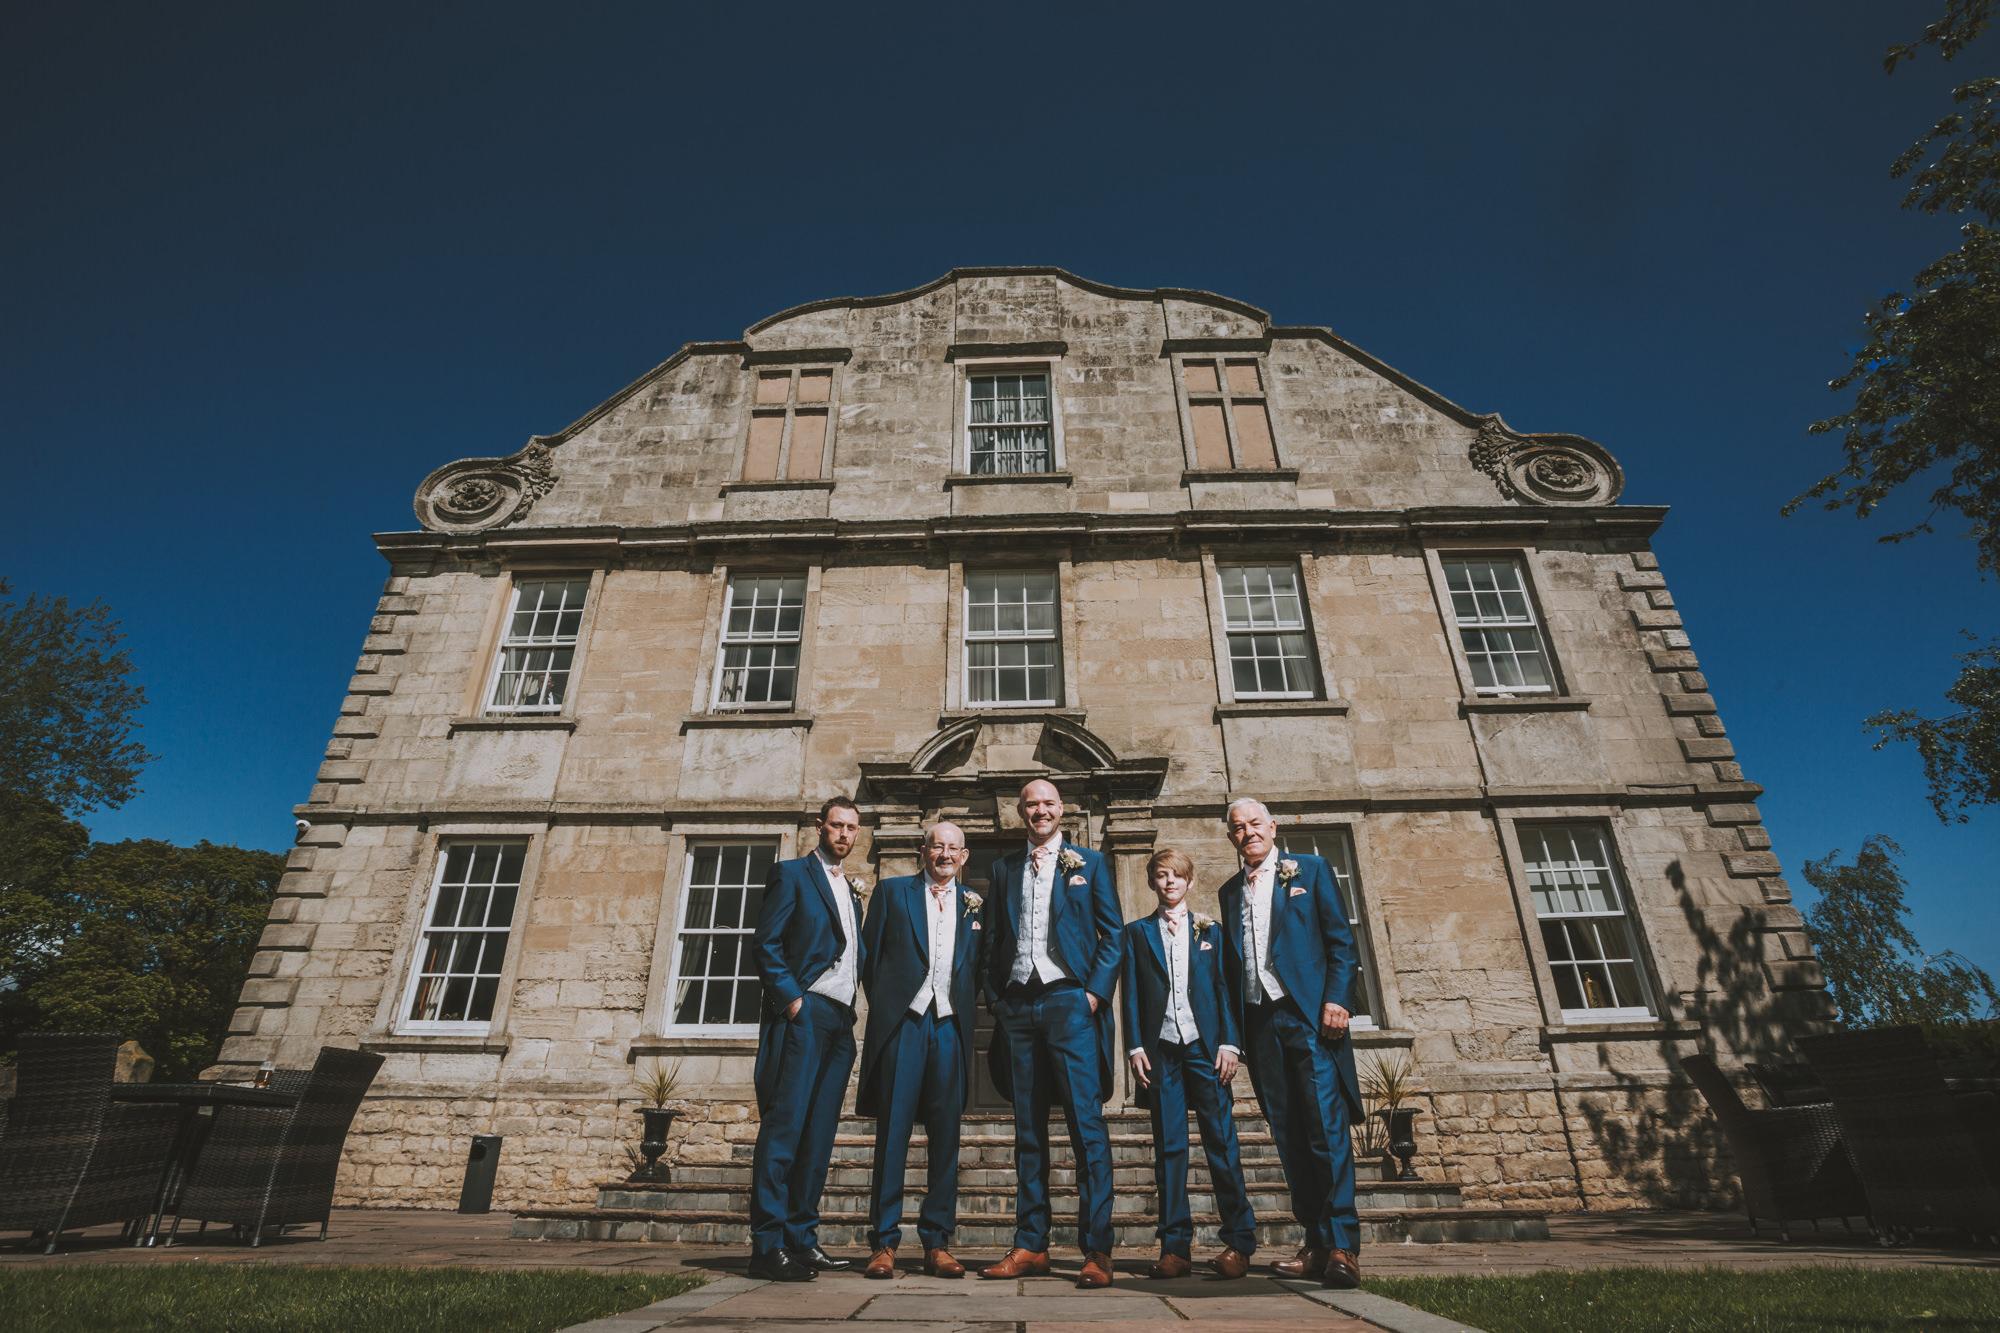 hellaby hall wedding photographers in rotherham, yorkshire-10.jpg